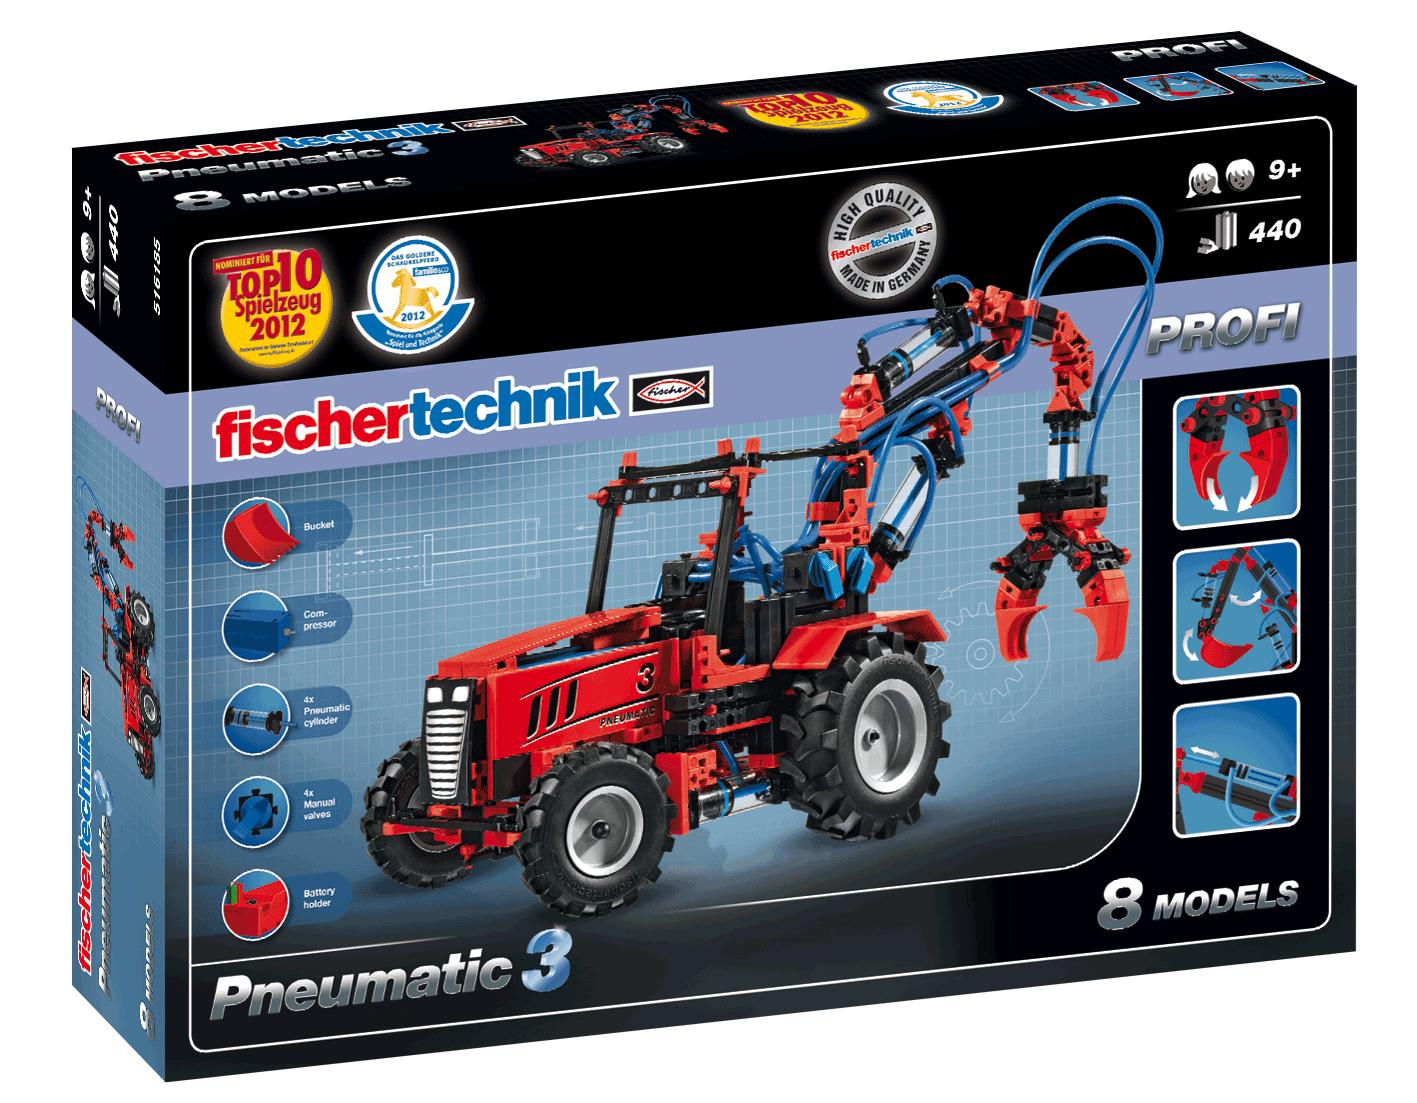 Pneumatic 3 Bausatz - 440 Teile Fischertechnik